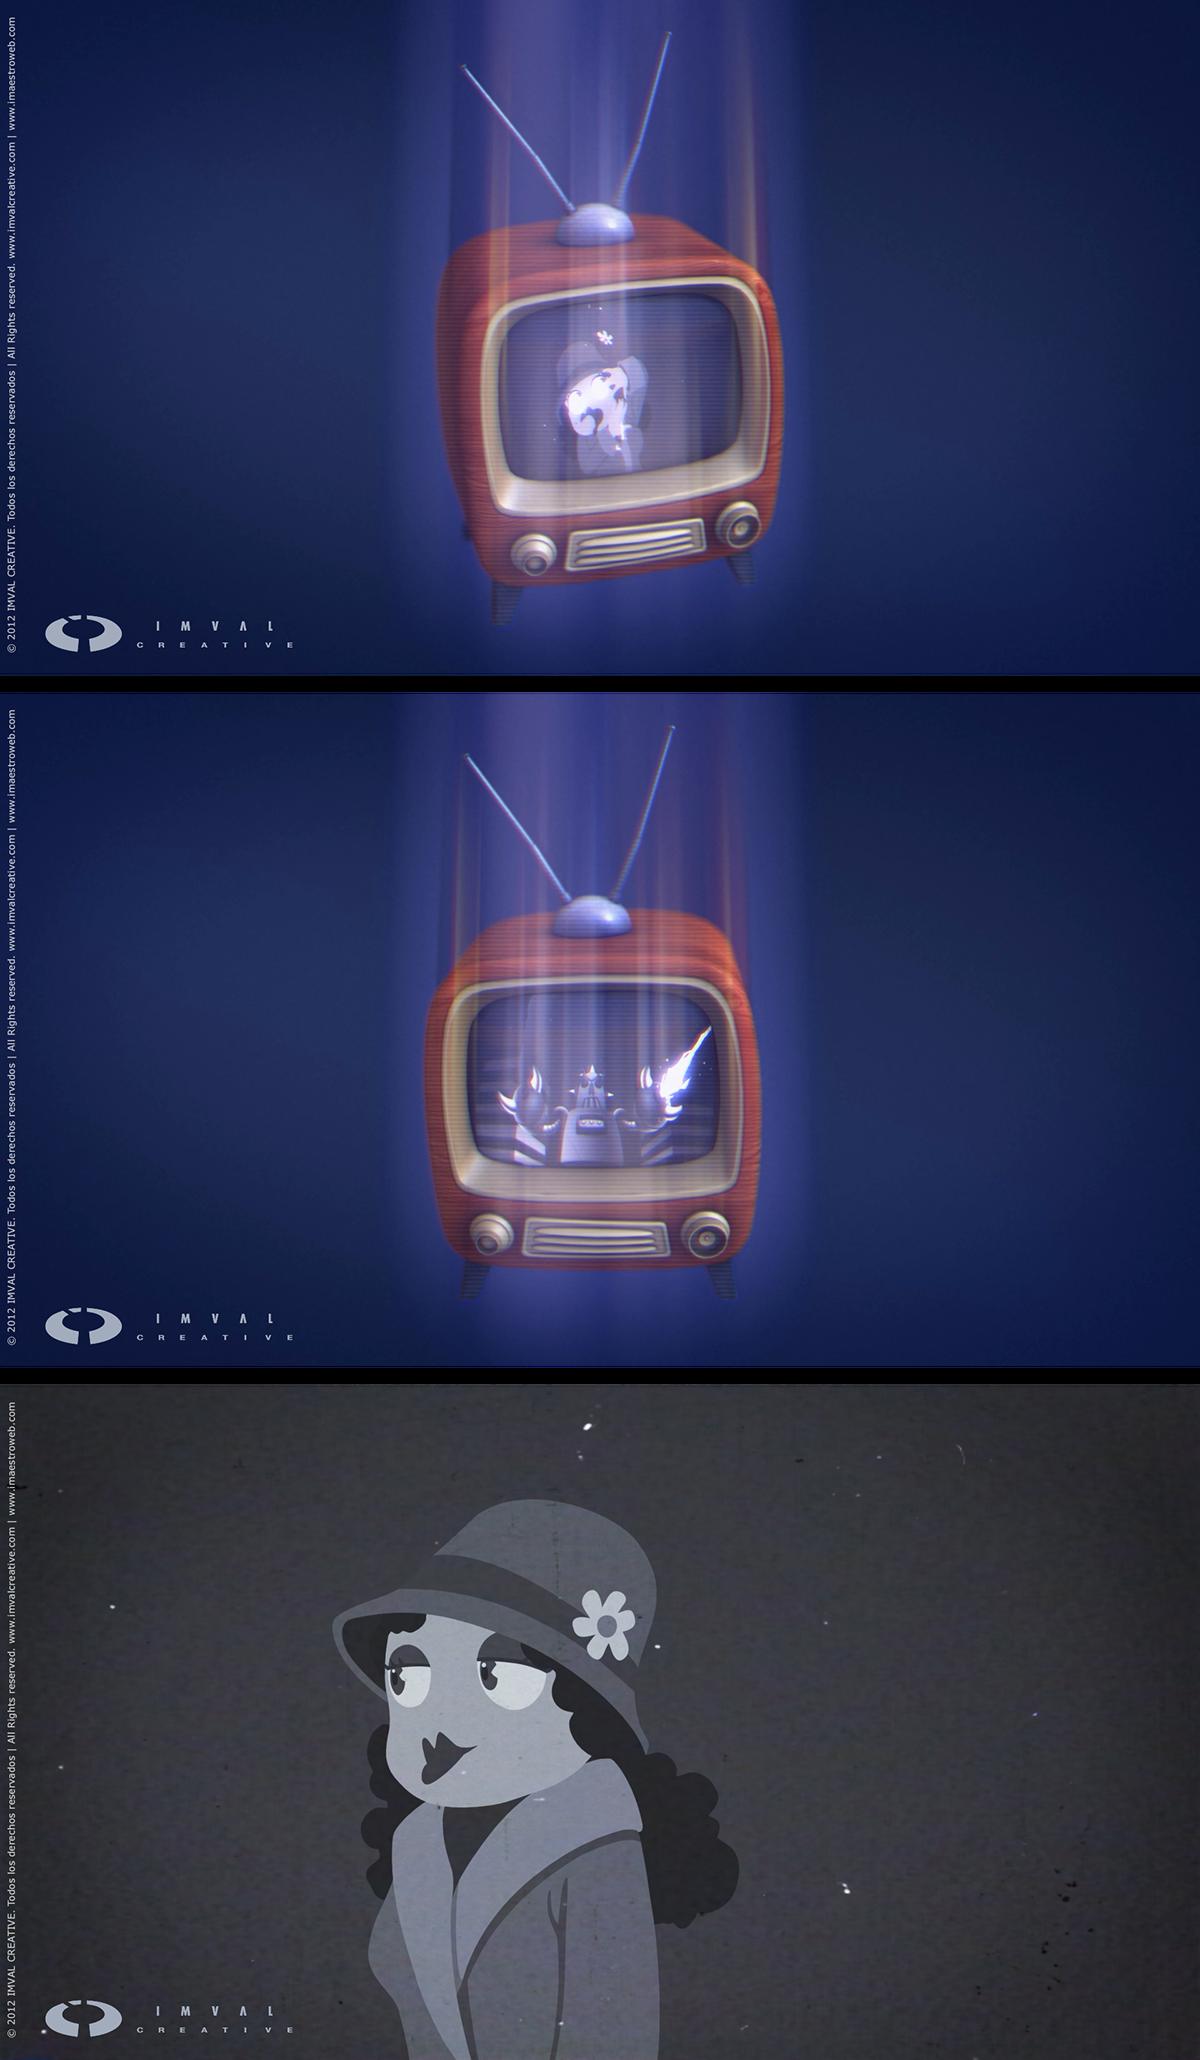 robot ict communication hologram transformer cartoon fire telephone Internet Telegraph tv television Computer Radio Benjamin Franklin